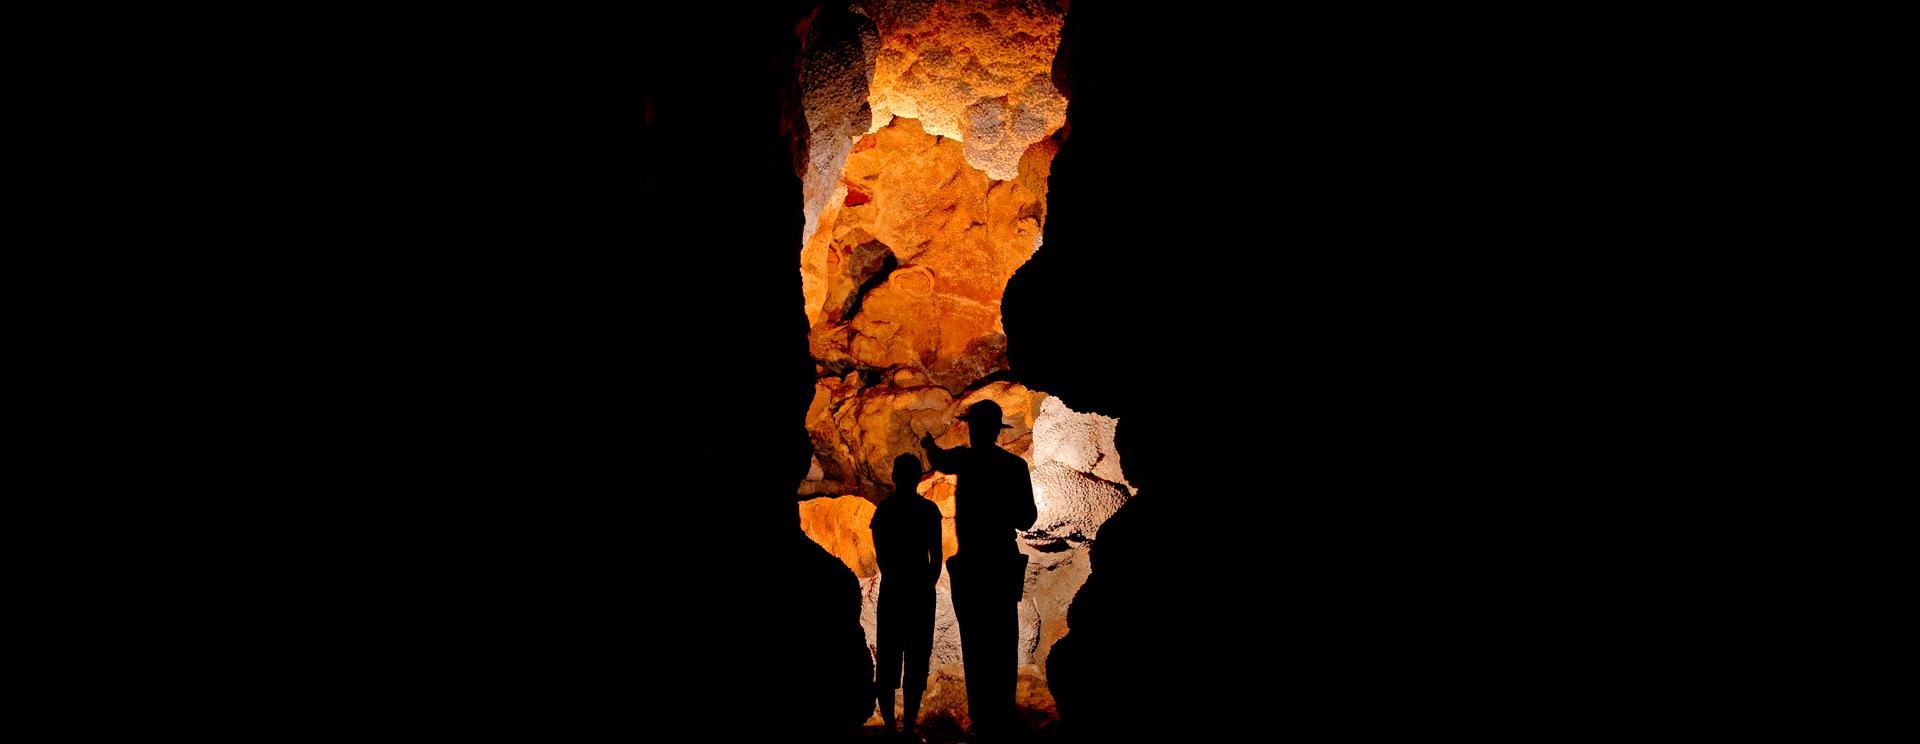 BH&B Partner Spotlight: Jewel Cave National Monument